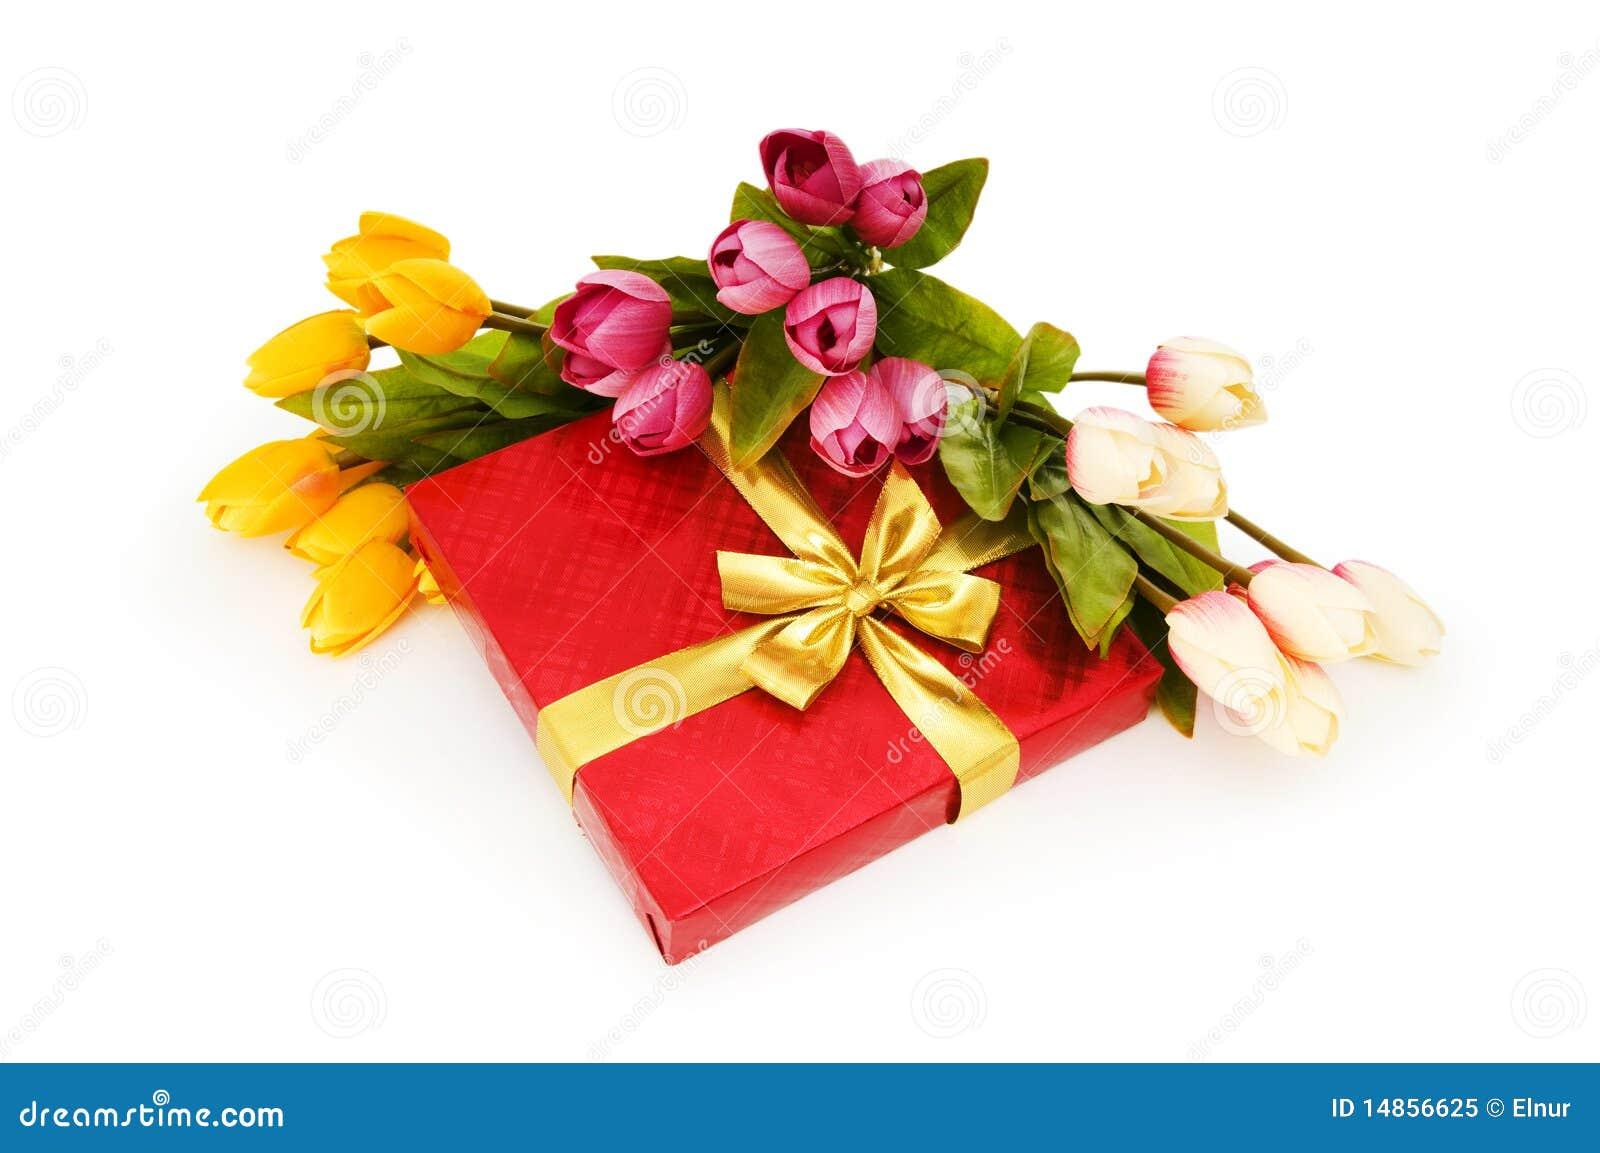 Giftbox et fleurs